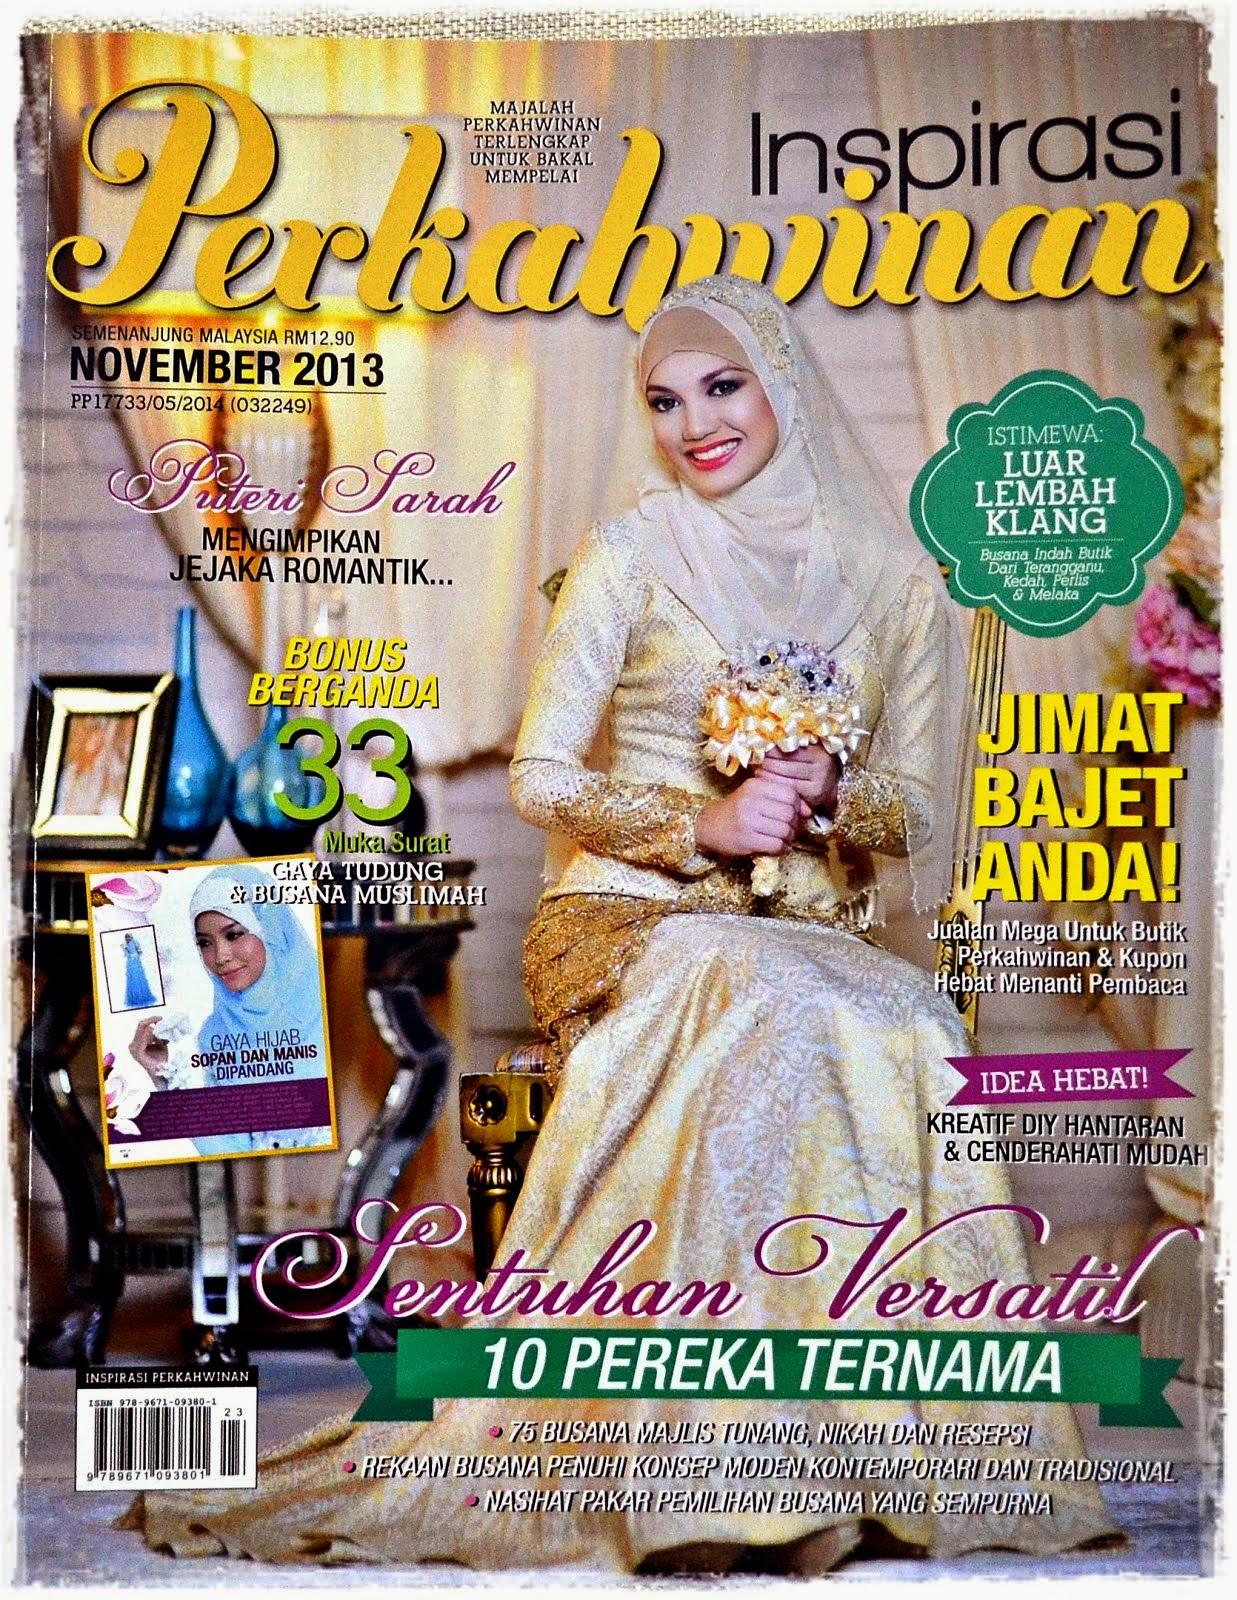 Inspirasi Perkahwinan November 2013